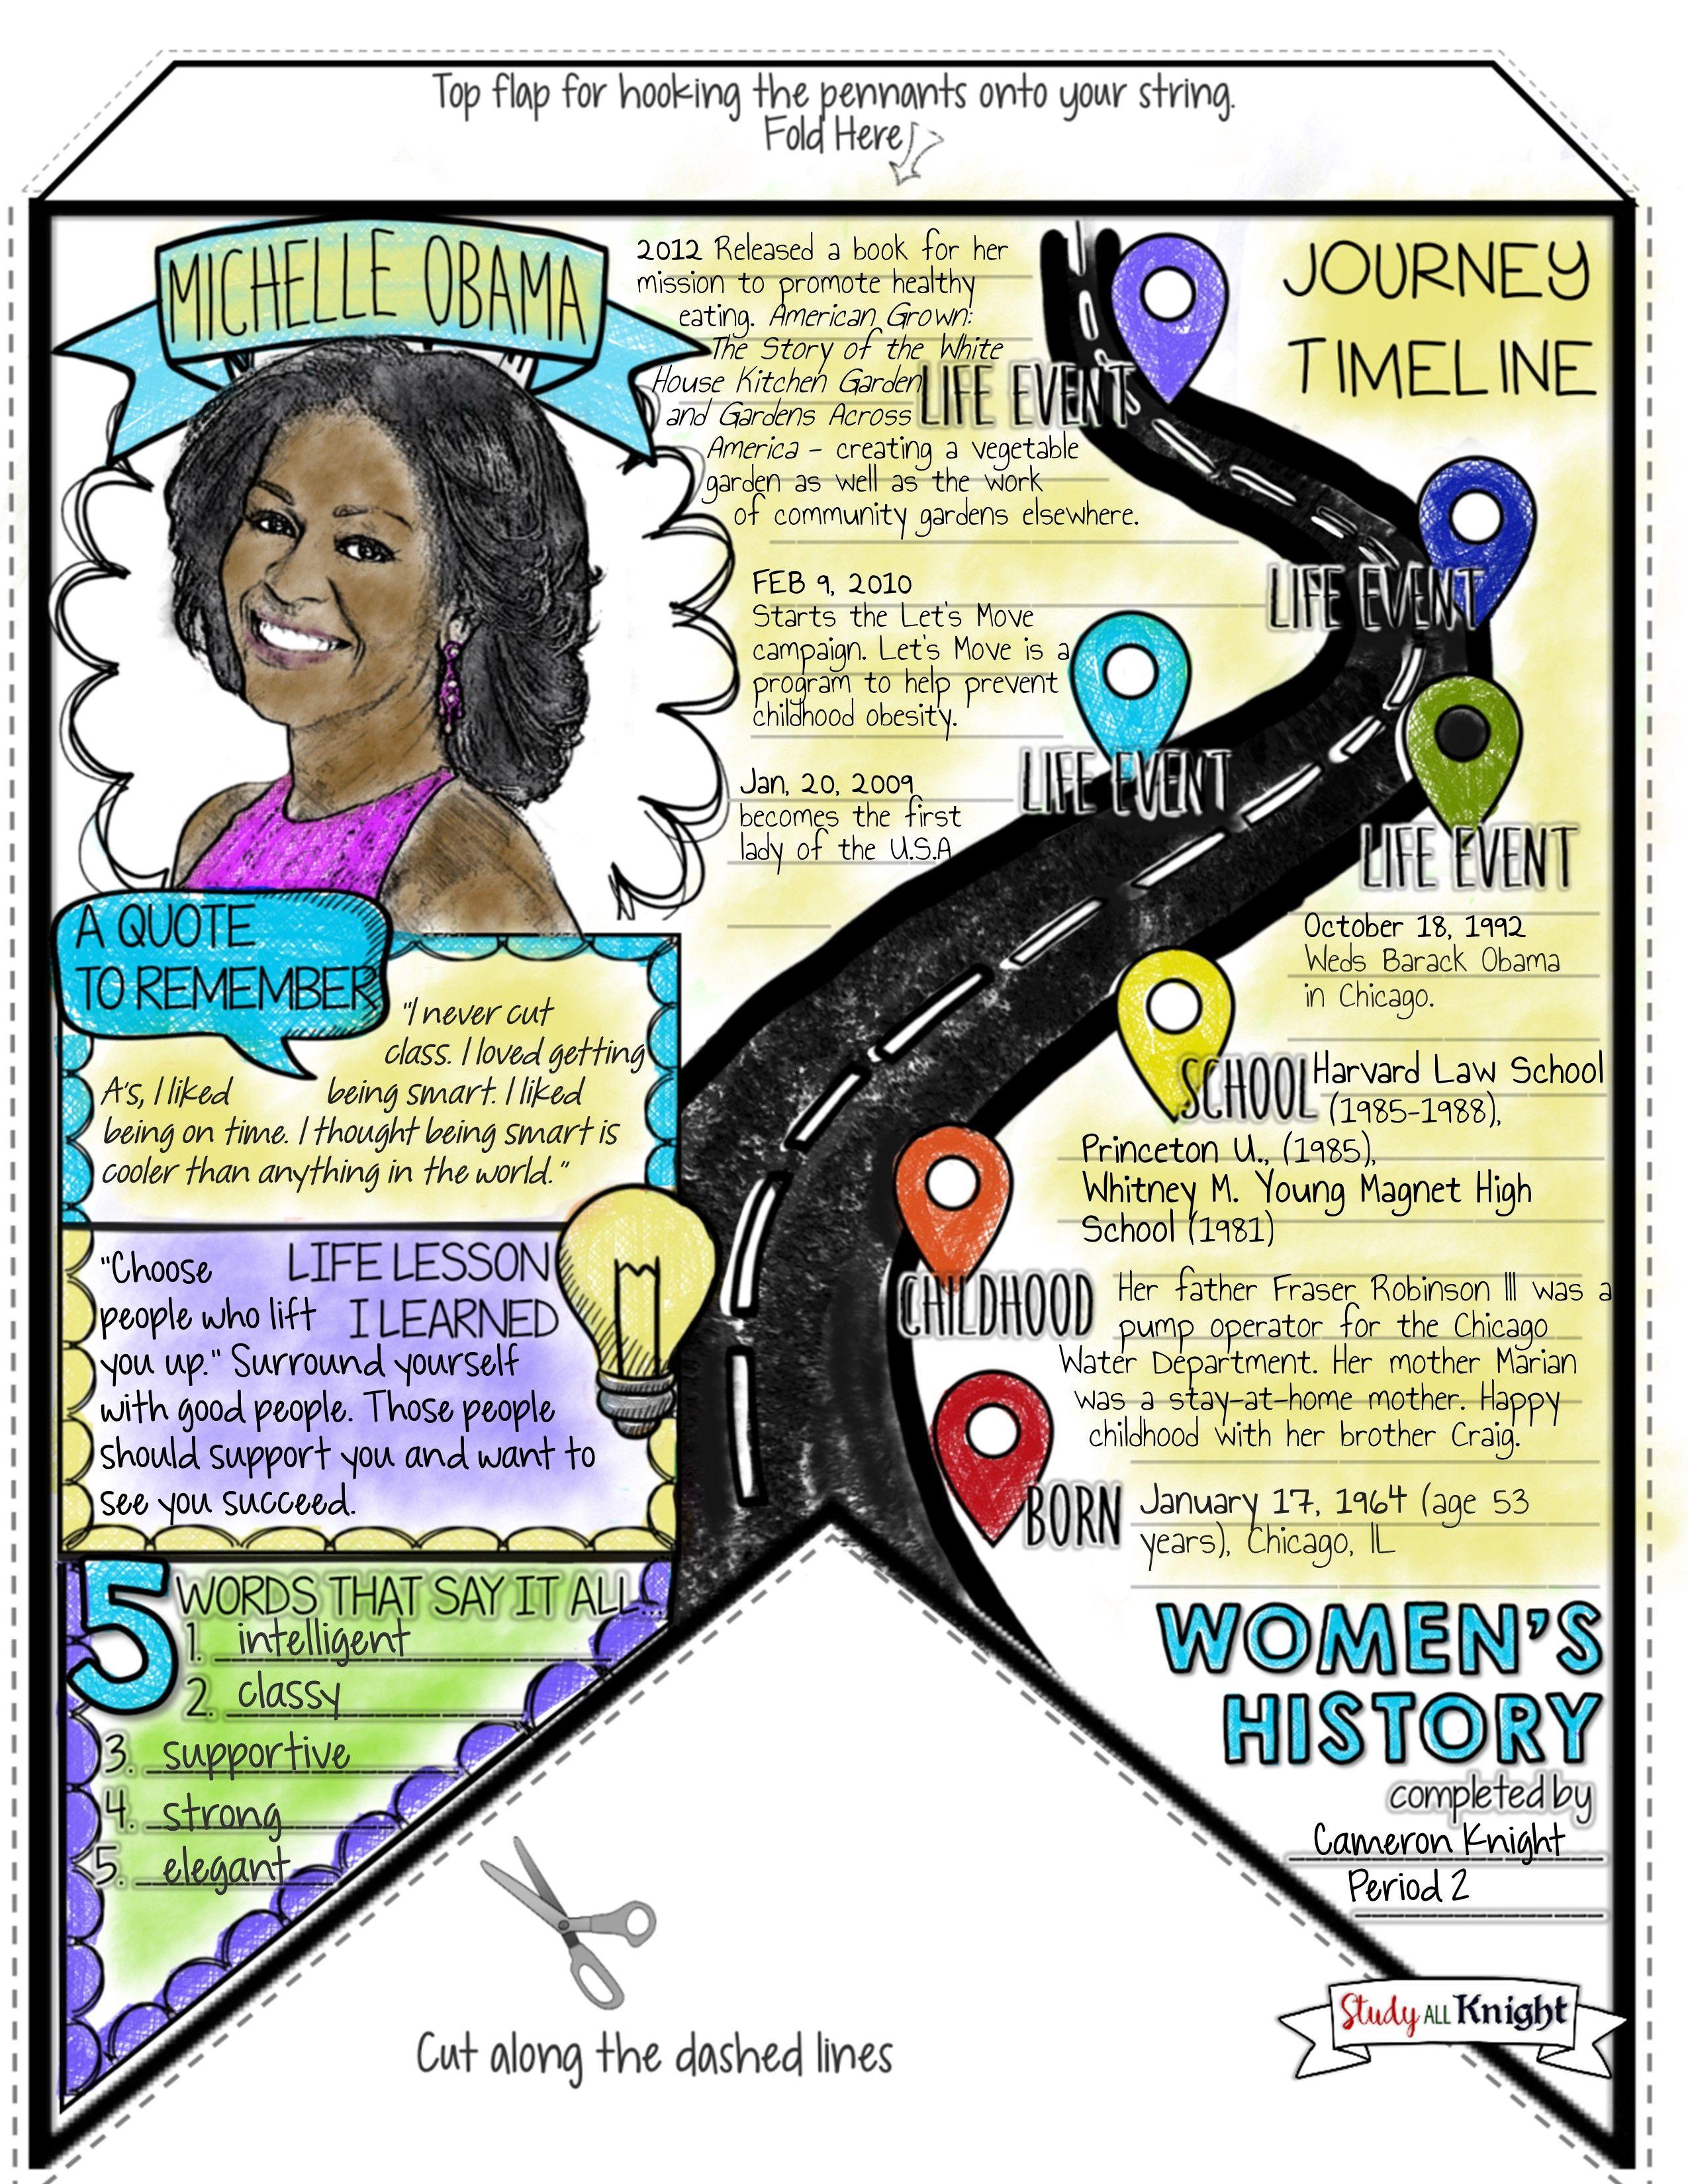 Women's History Month [ 3300 x 2550 Pixel ]